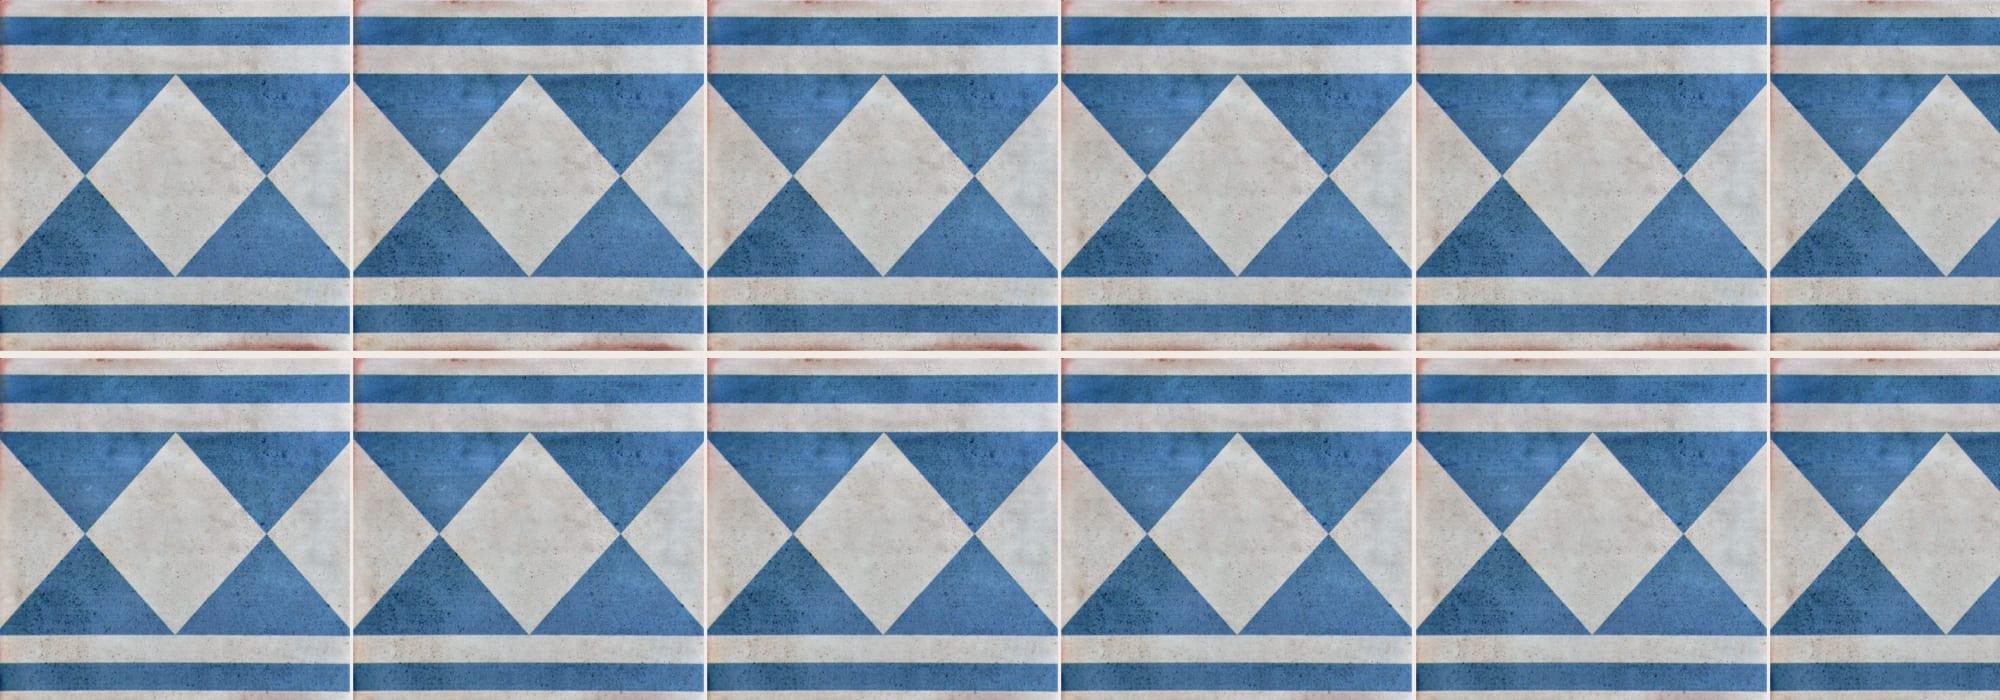 Ceramic tile wallpaper